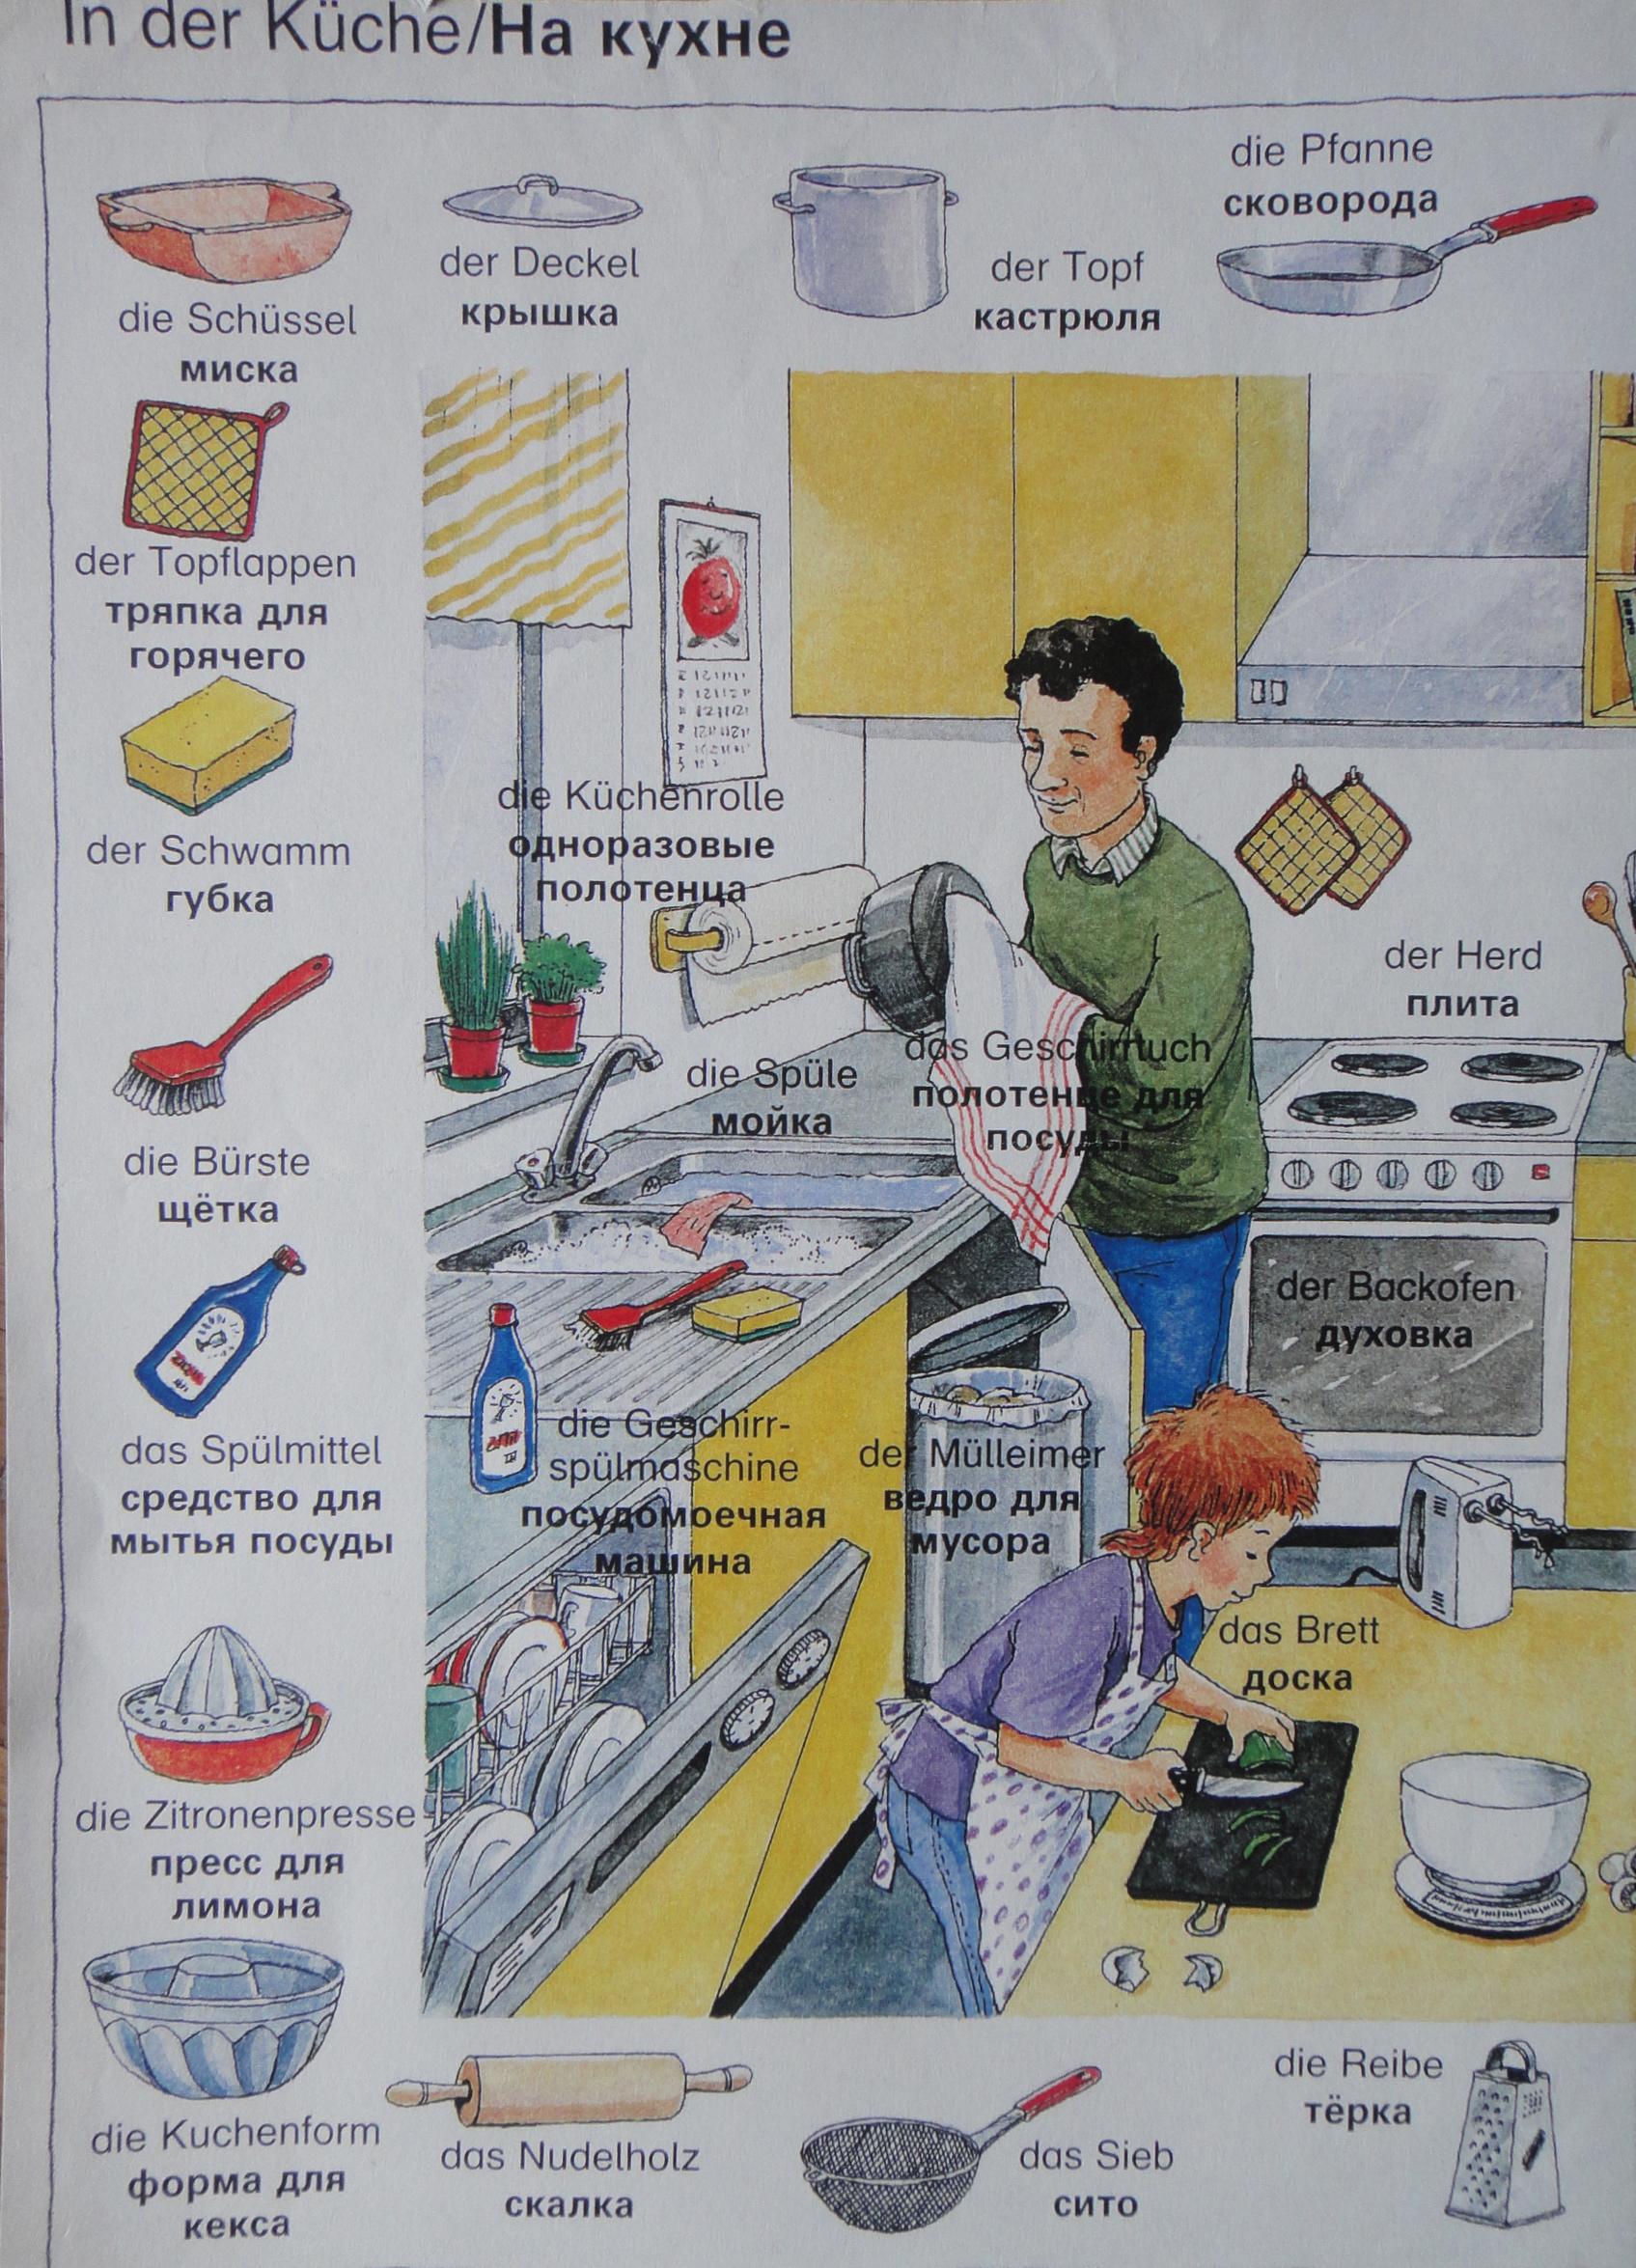 In the kitchen - German / Cyrillic